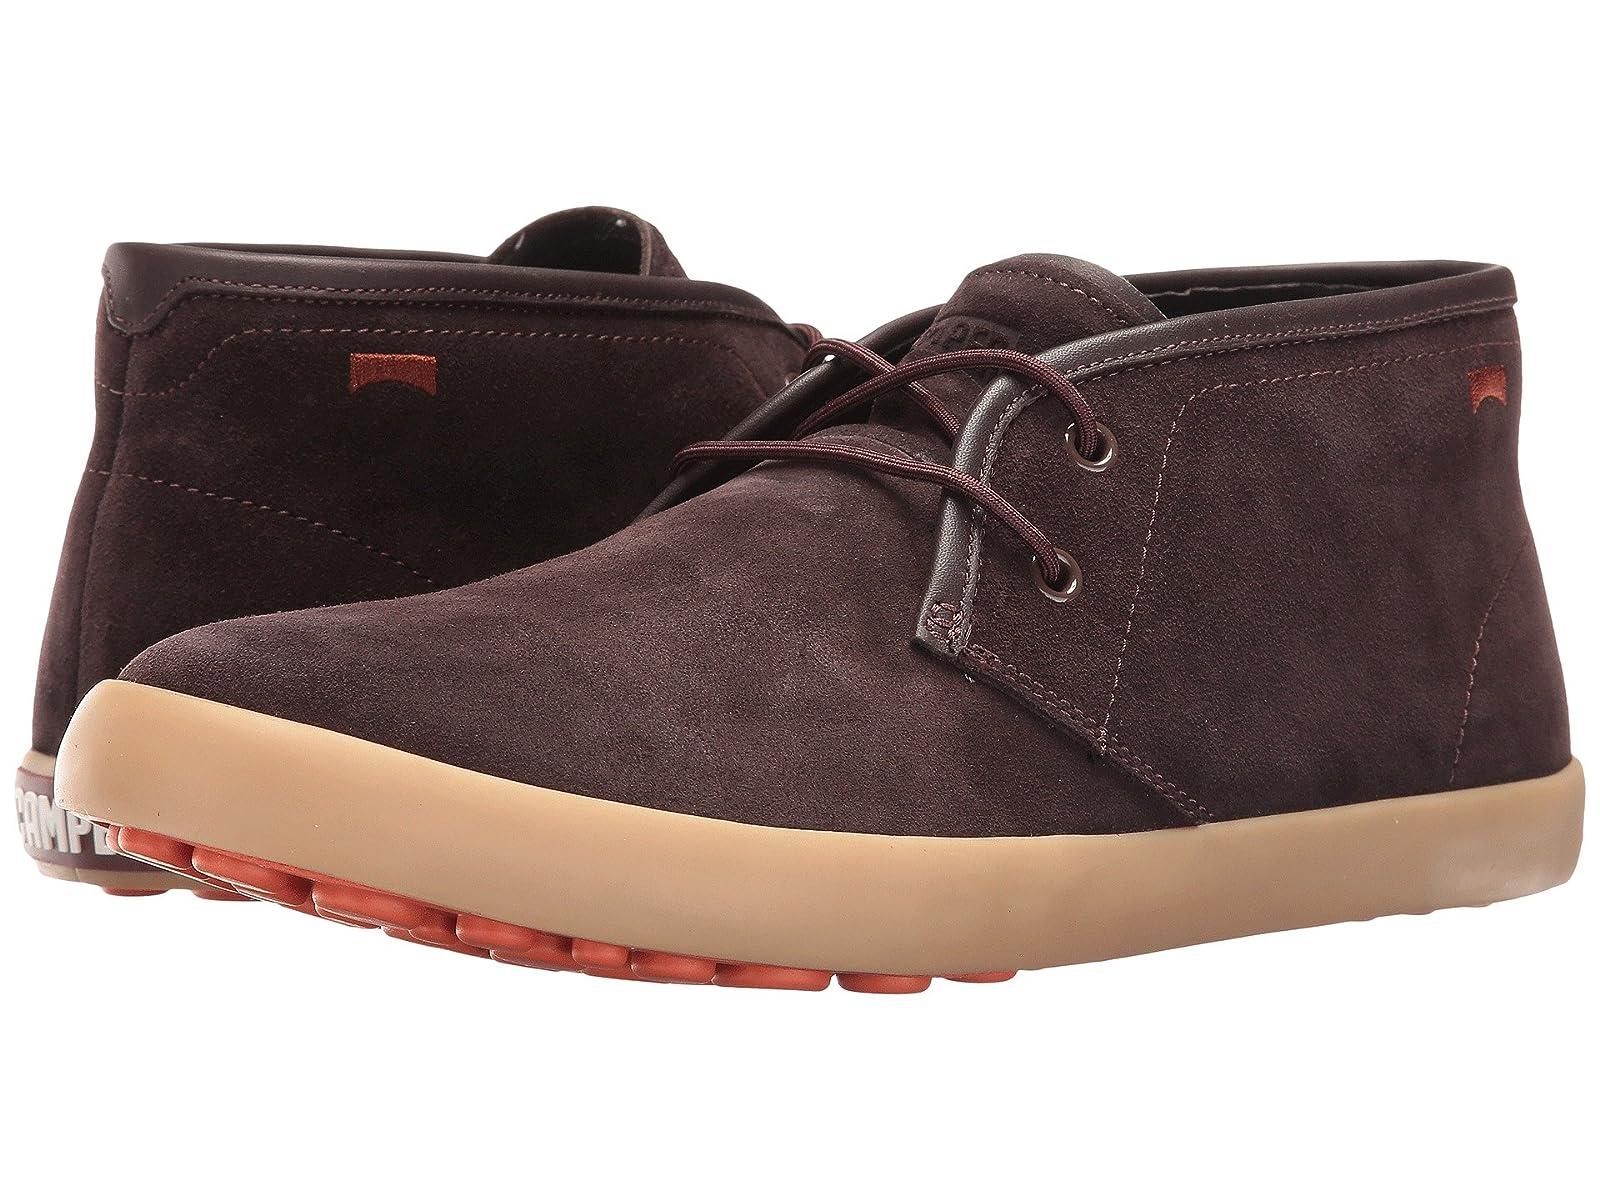 Camper Pelotas Persil Vulcanizado - K300017Cheap and distinctive eye-catching shoes